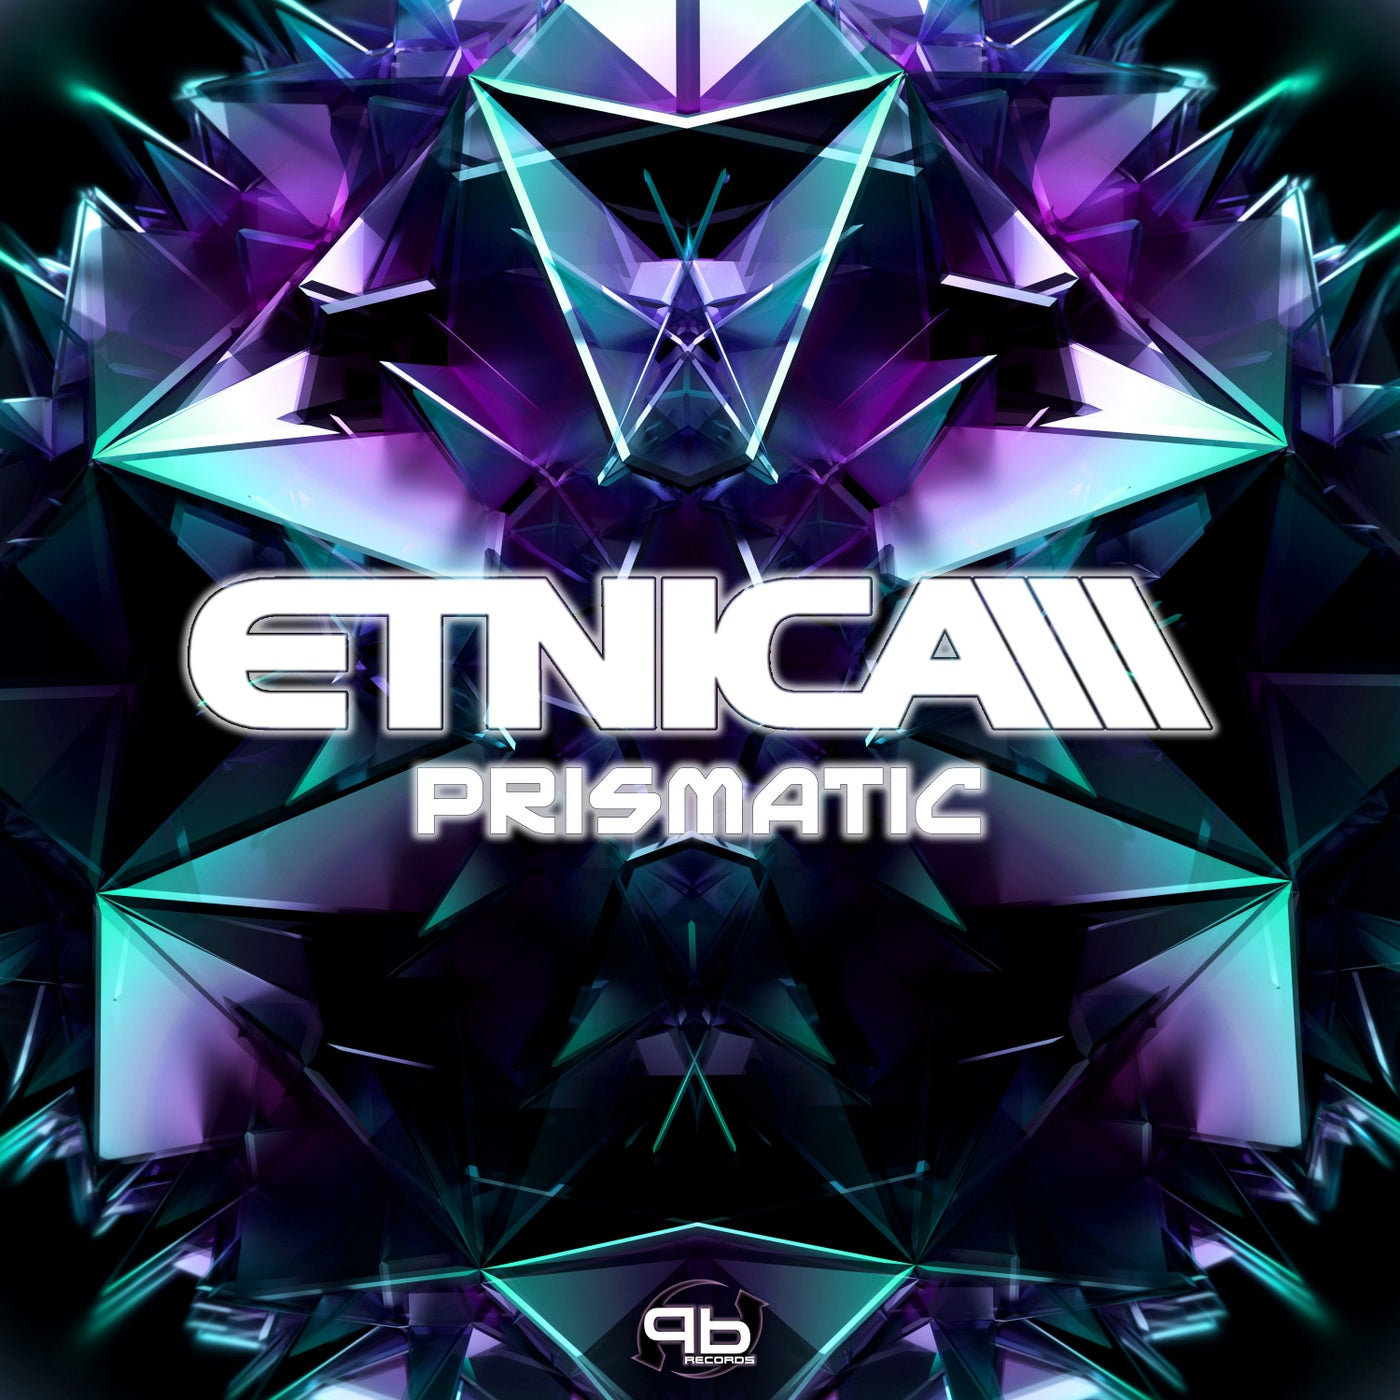 Prismatic (Original Mix)